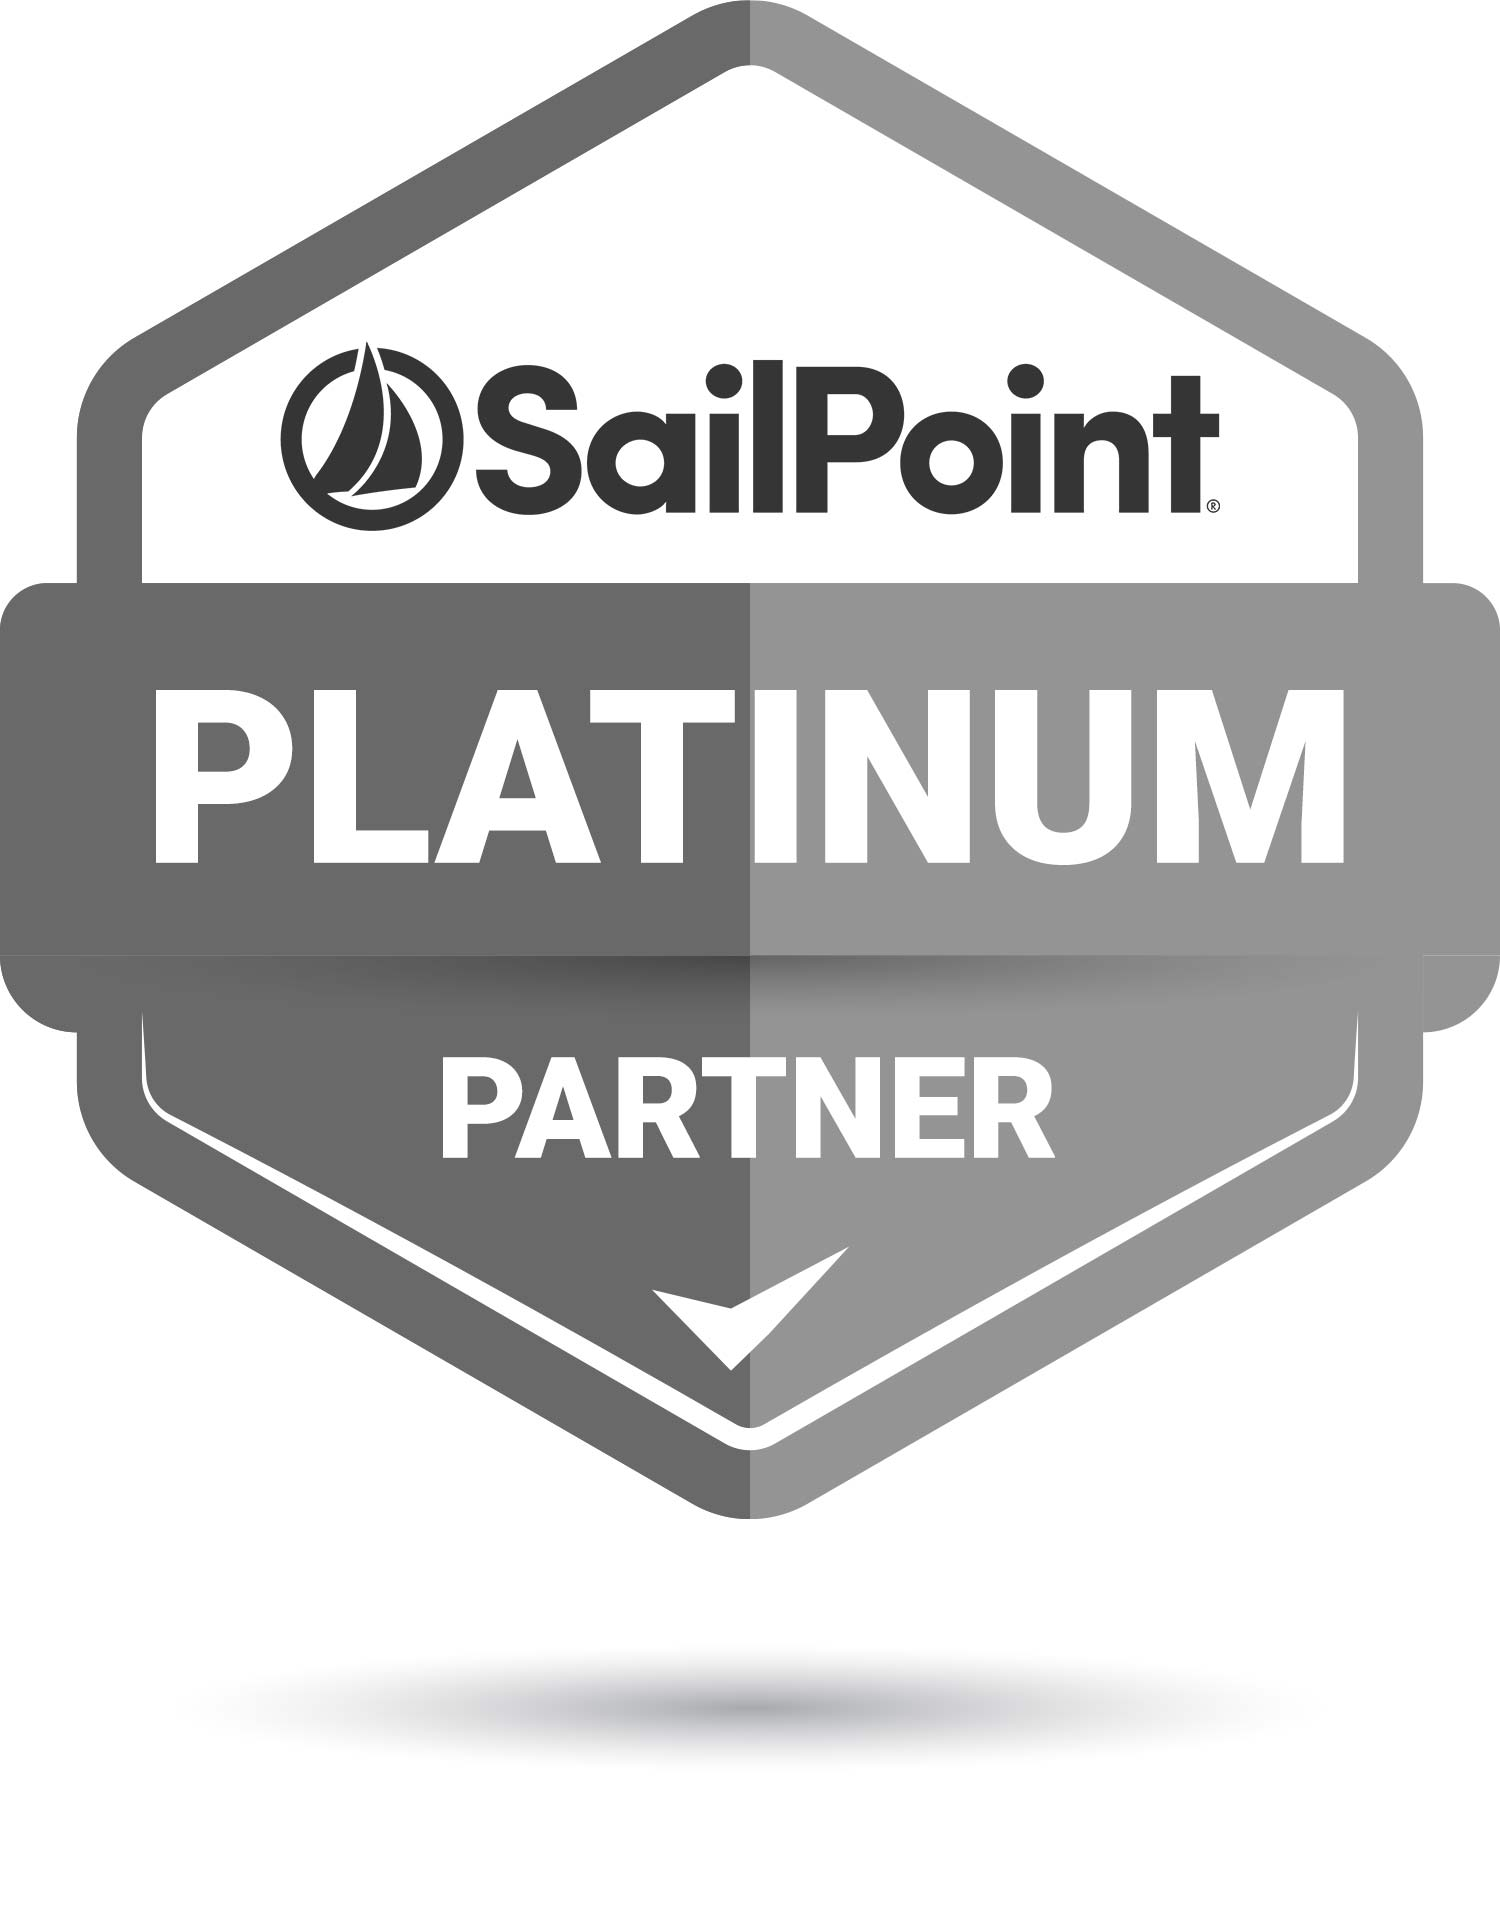 Sailpoint Platinum Partner